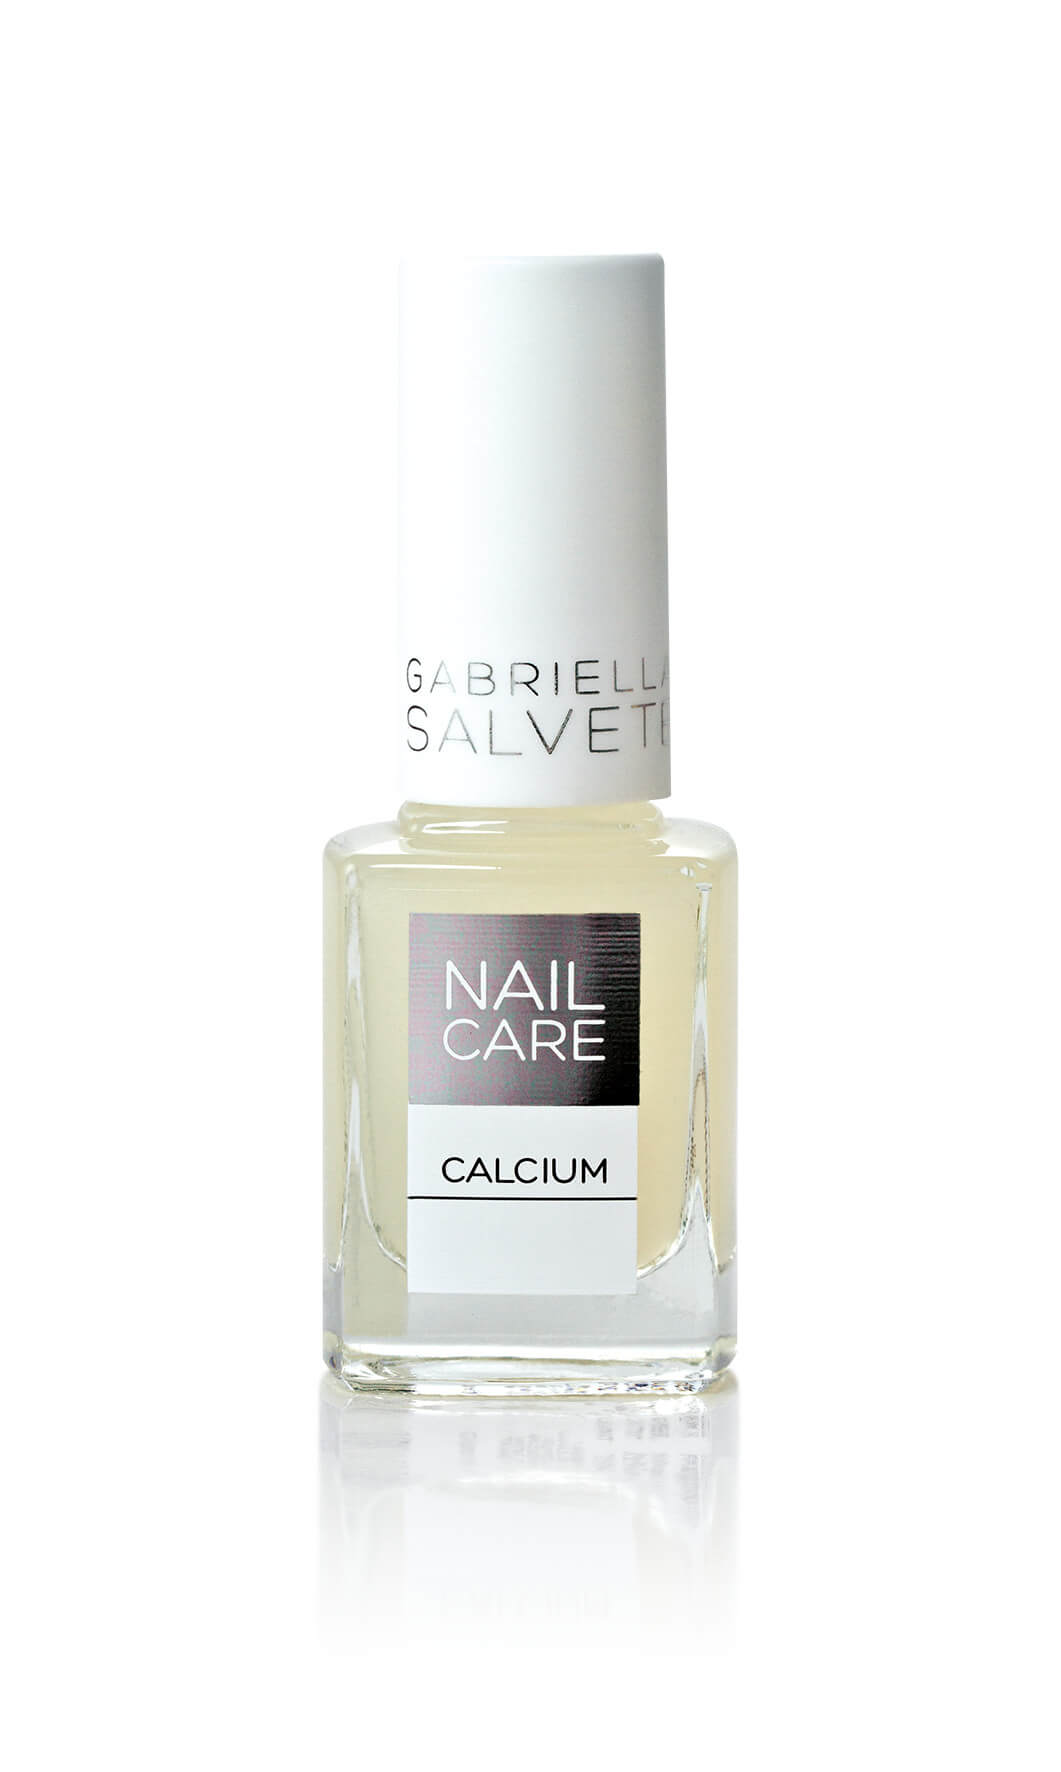 Regeneracni Lak Na Nehty S Kalciem Nail Care Calcium 11 Ml Krasa Cz